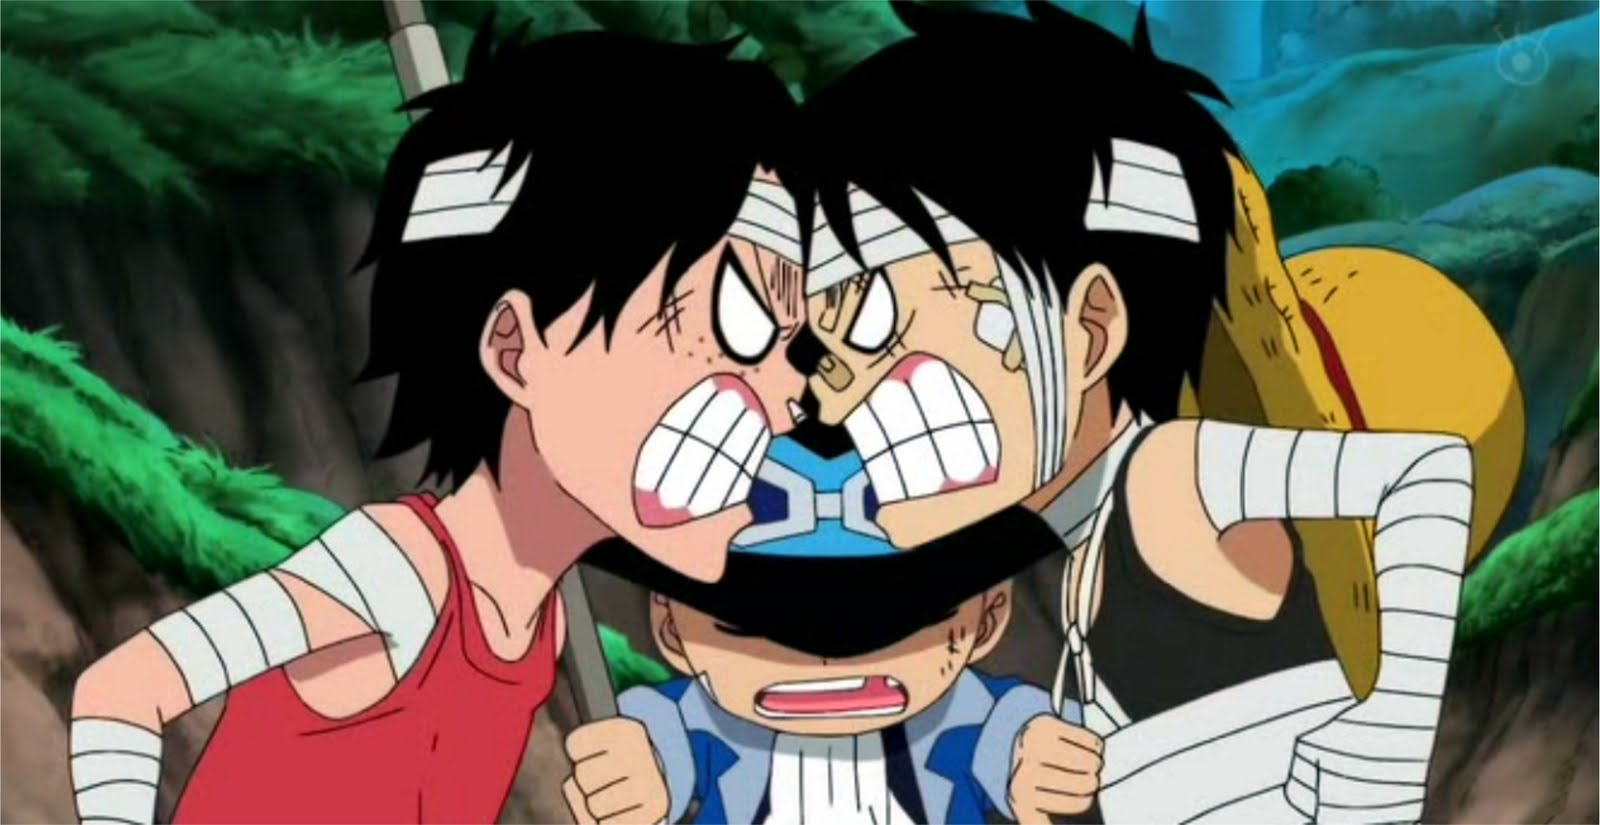 Manga - Artist: Ace & Sabo & Luffy Shattered Dream AMV ...